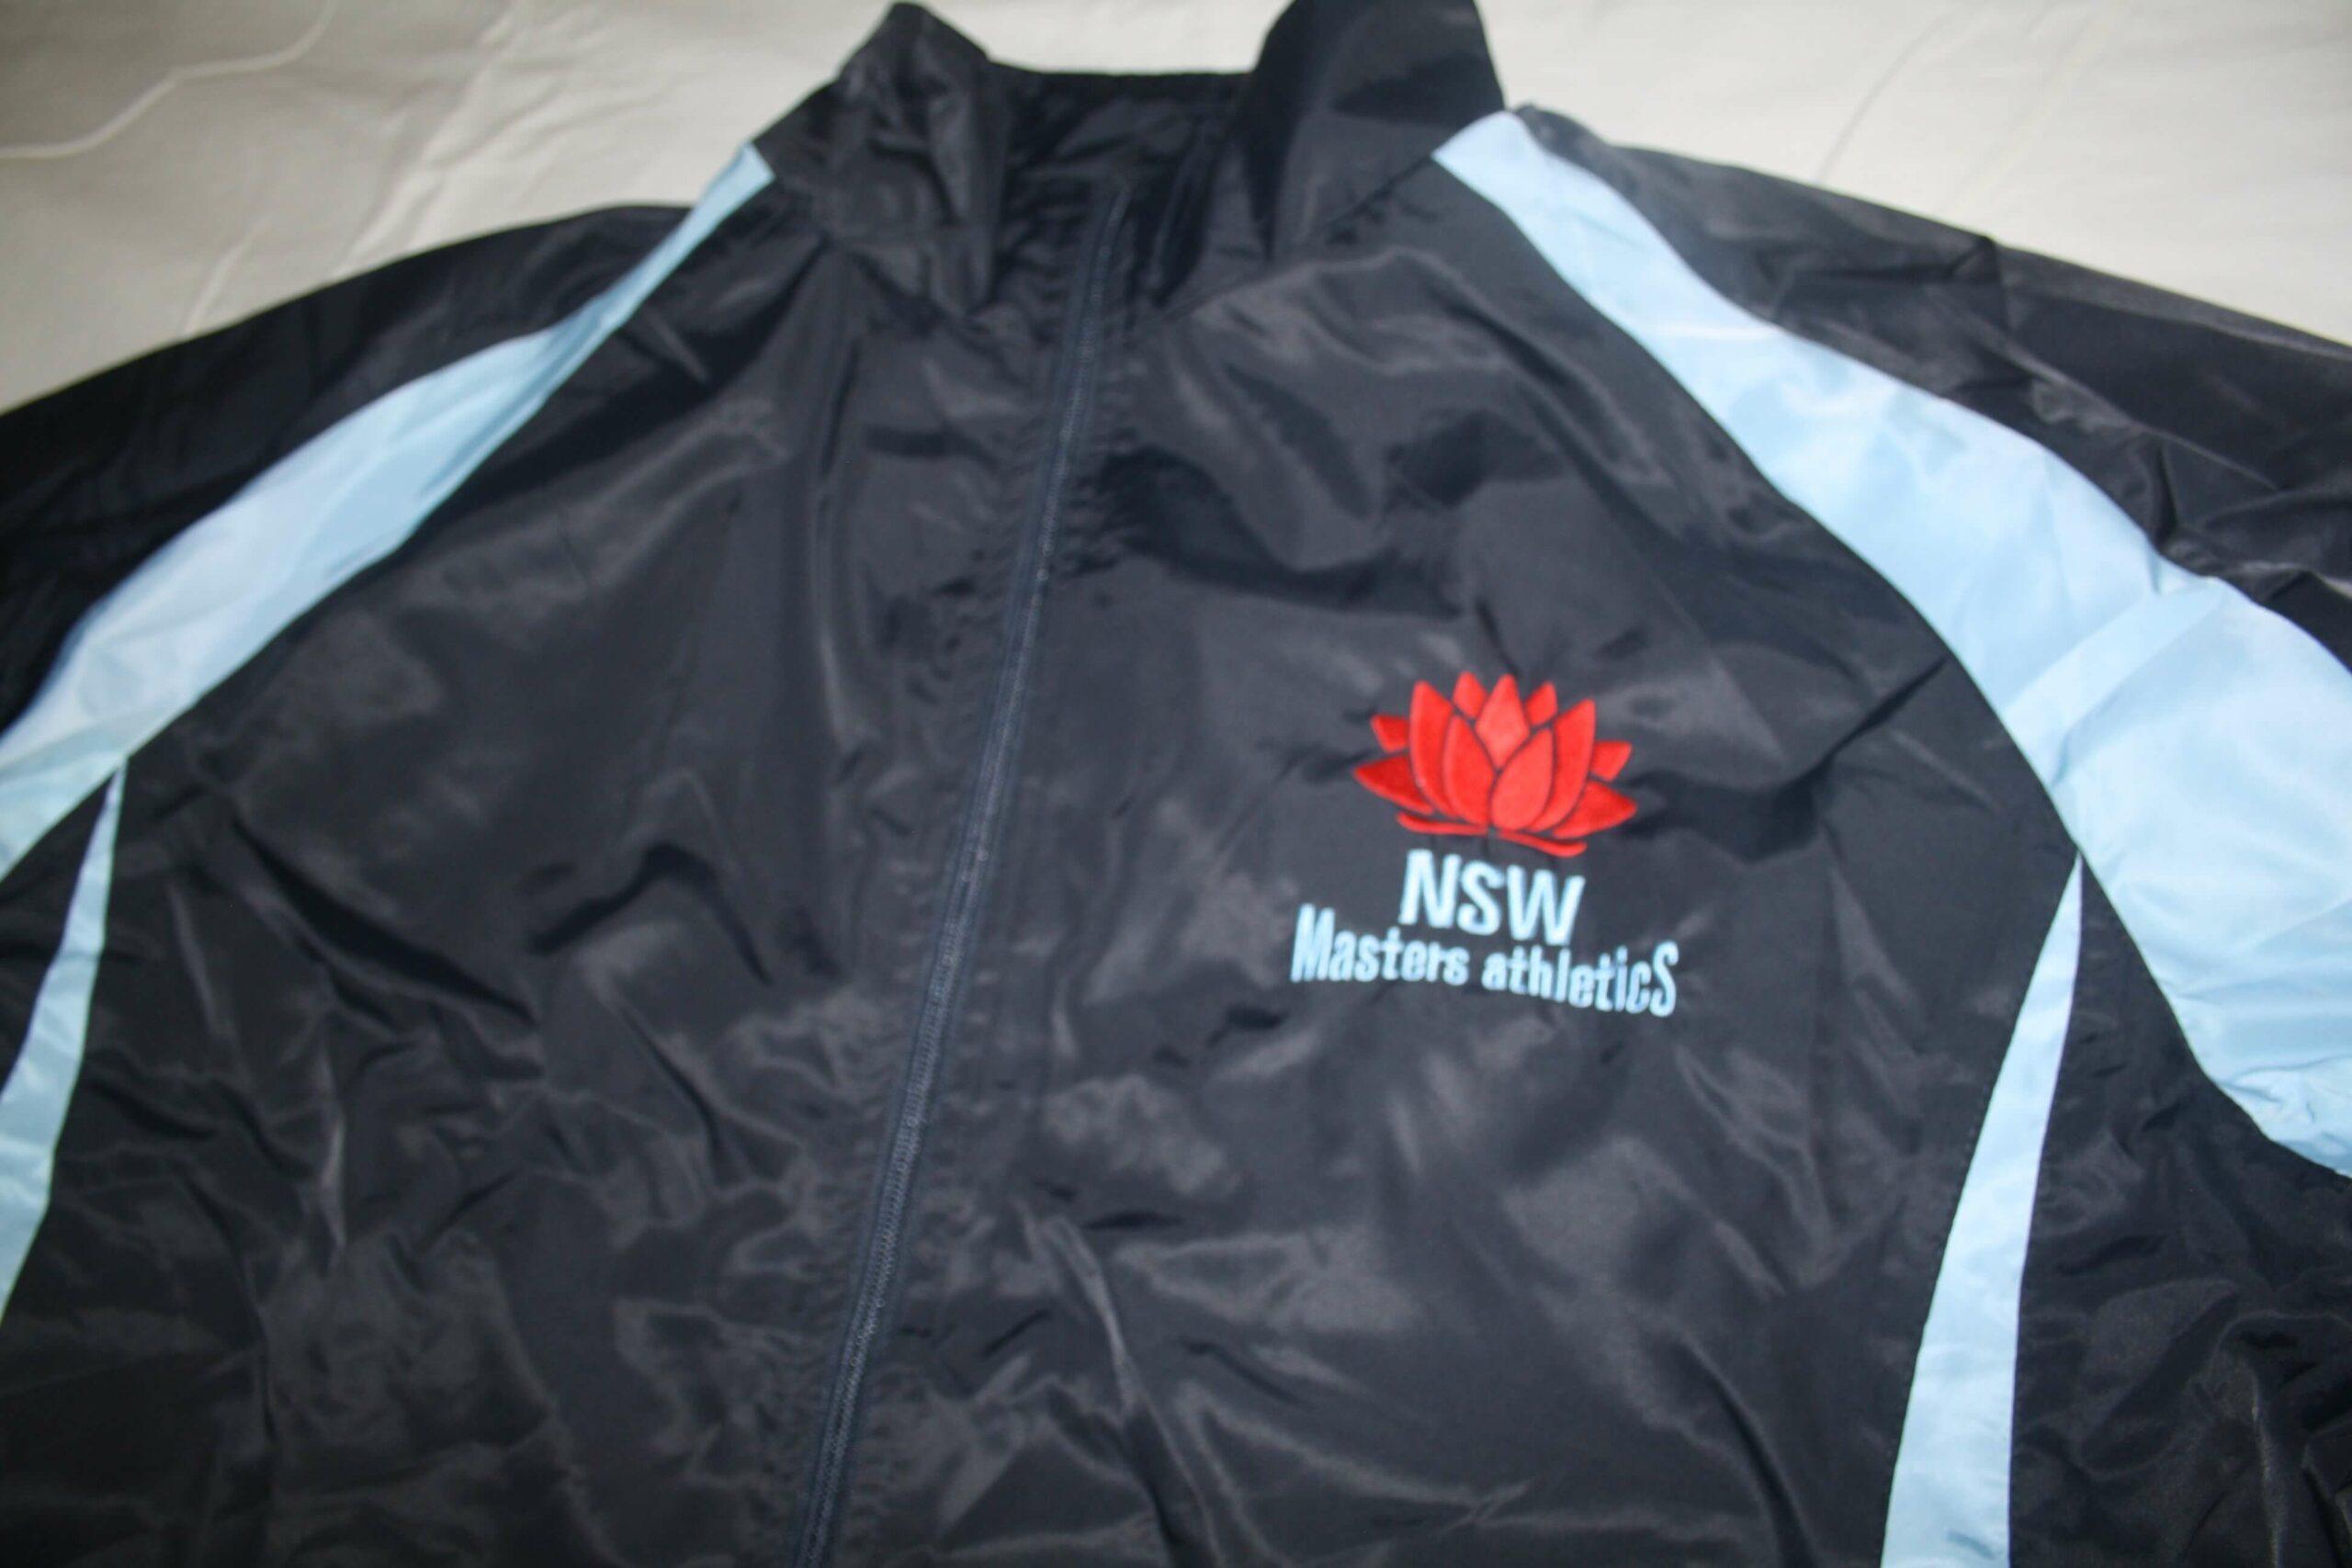 NSWMA Track Jacket logo image